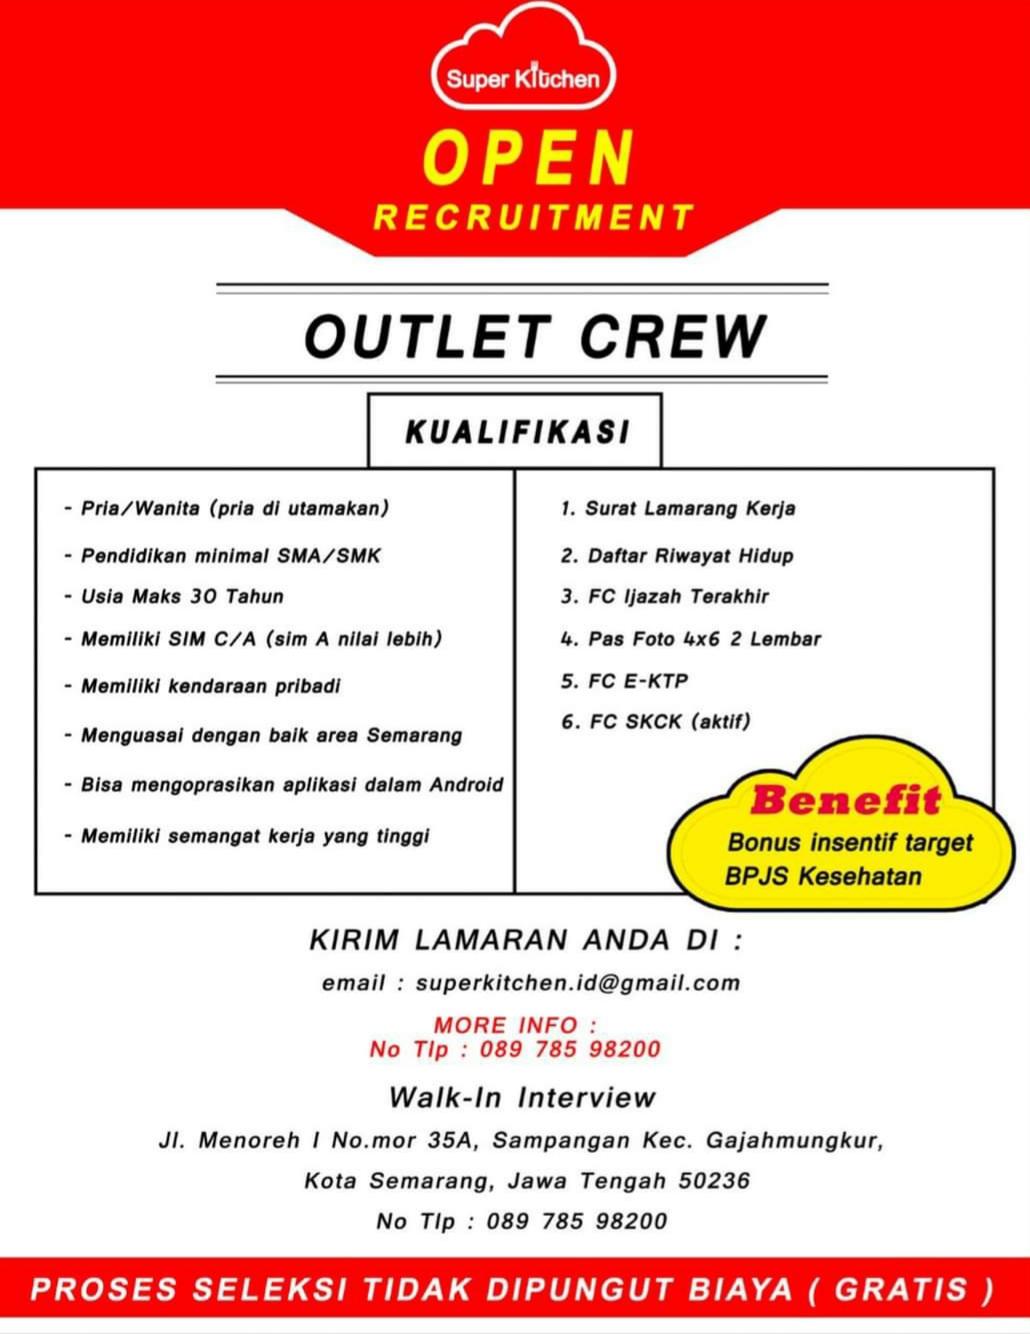 Super Kitchen Open Recruitment Outlet Crew Penempatan di Sampangan Semarang